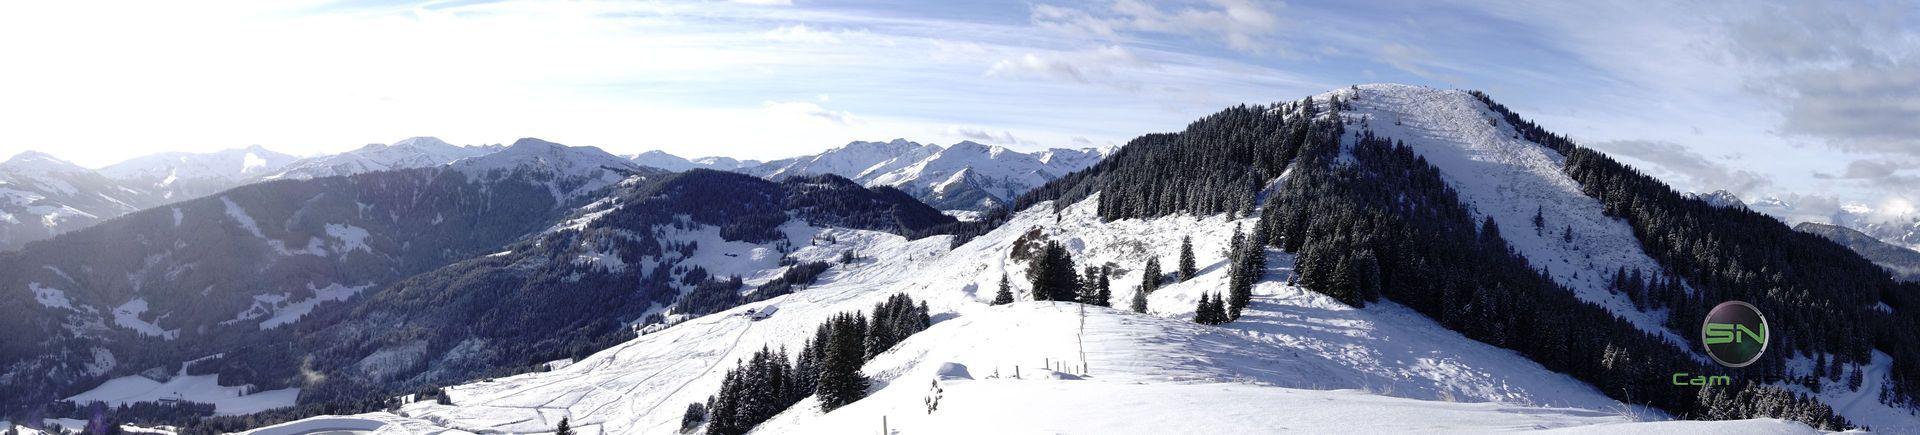 Panorama Wildschönau - Sony RX100mIV - SmartCamNews